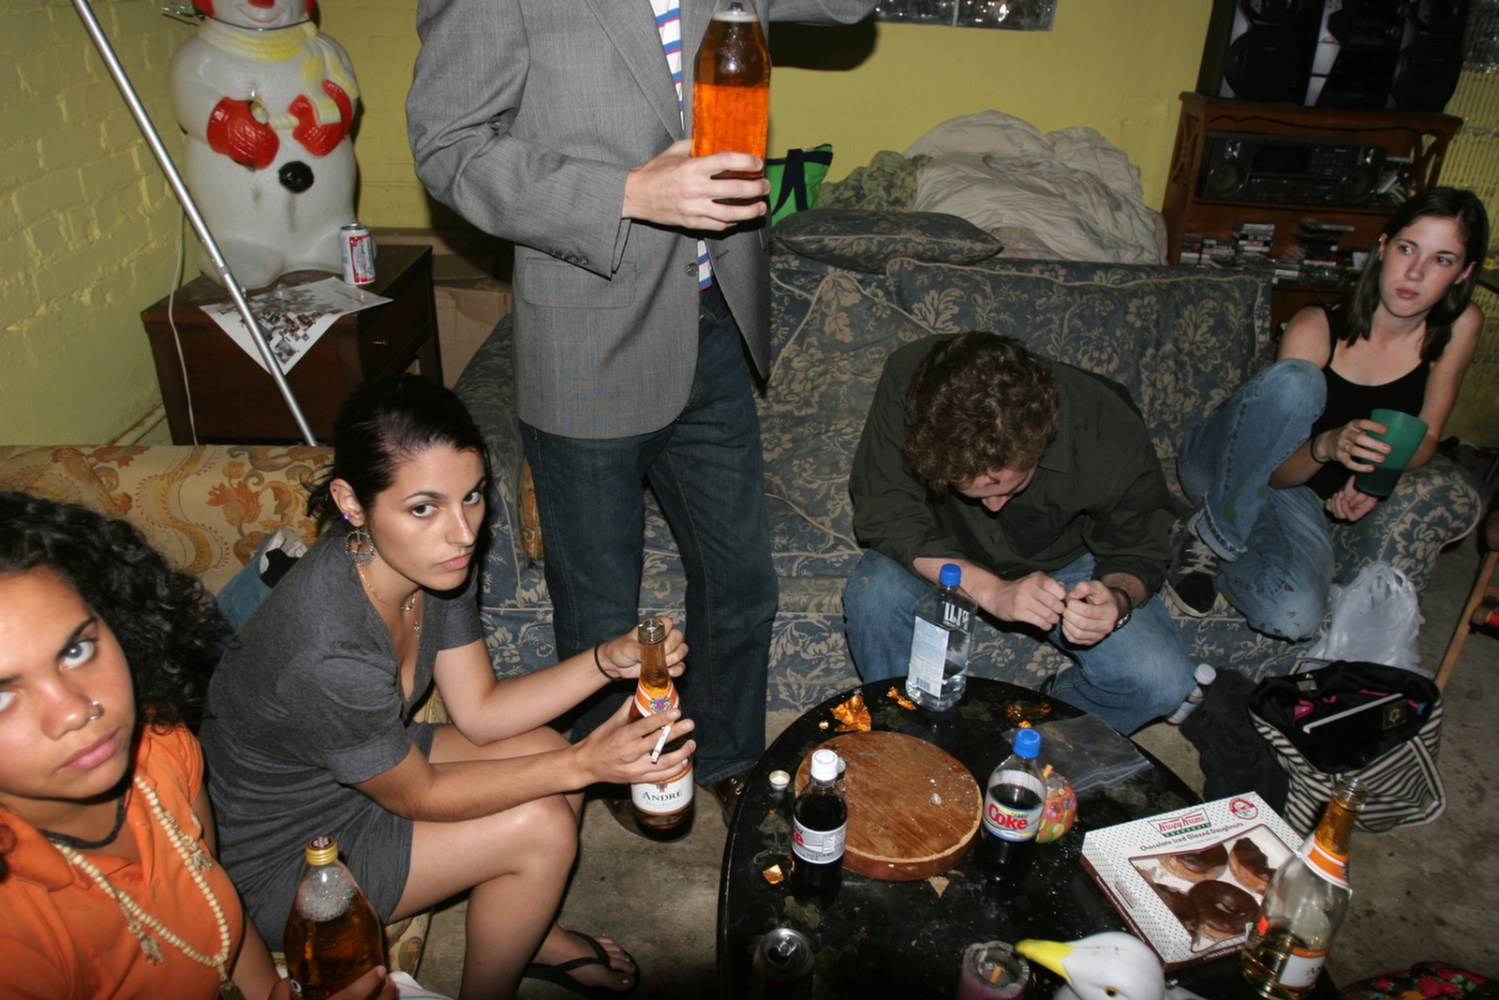 """I Wasn't Allowed to Have Friends"" /Sofia, Hannah, Danny, Alex & Jenn,2005"